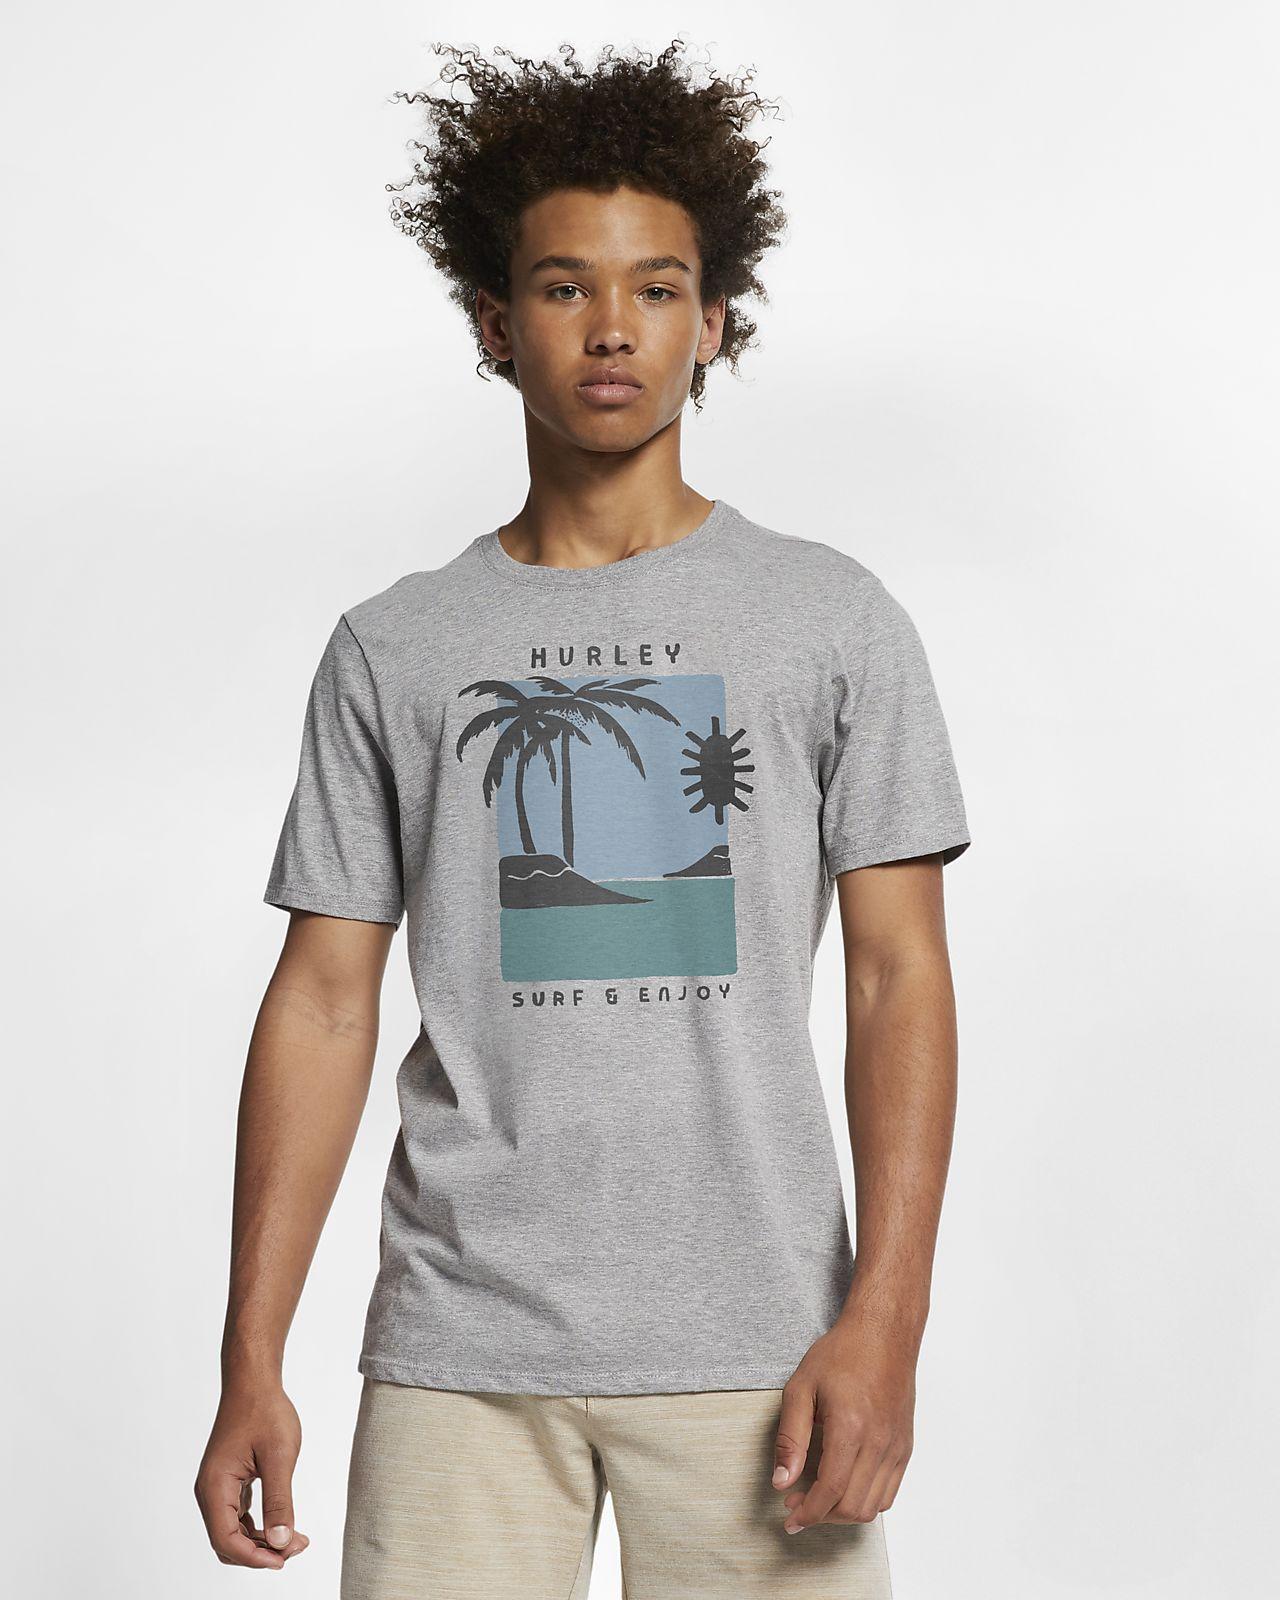 Hurley Premium Good Times Men's T-Shirt